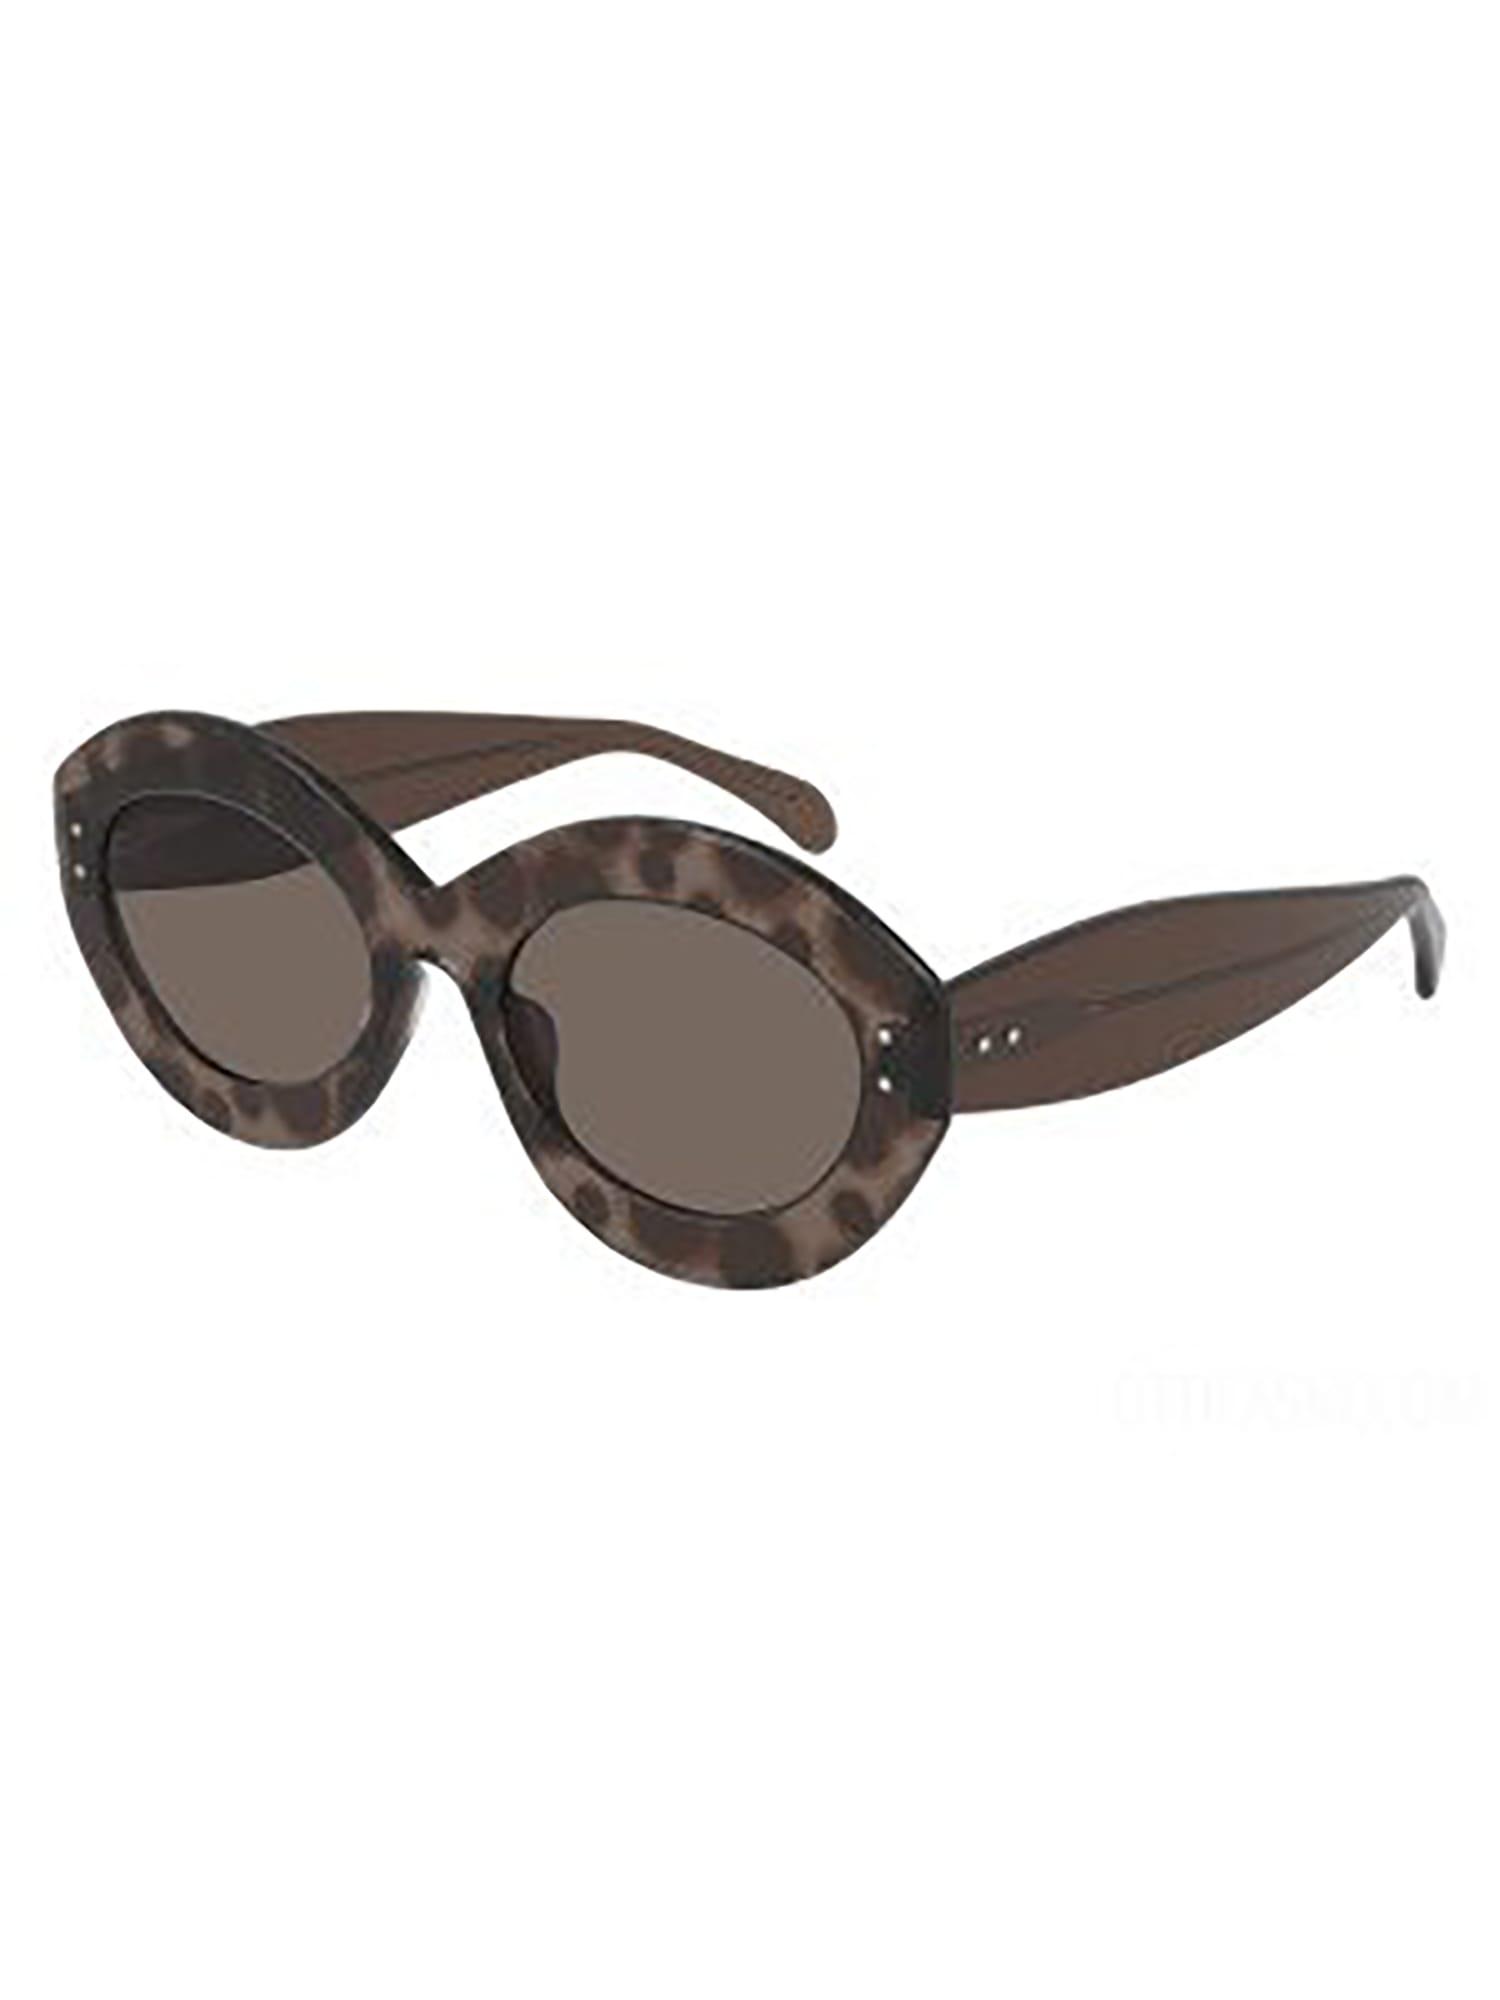 Alaïa Aa0004s Sunglasses In Brown Brown Brown